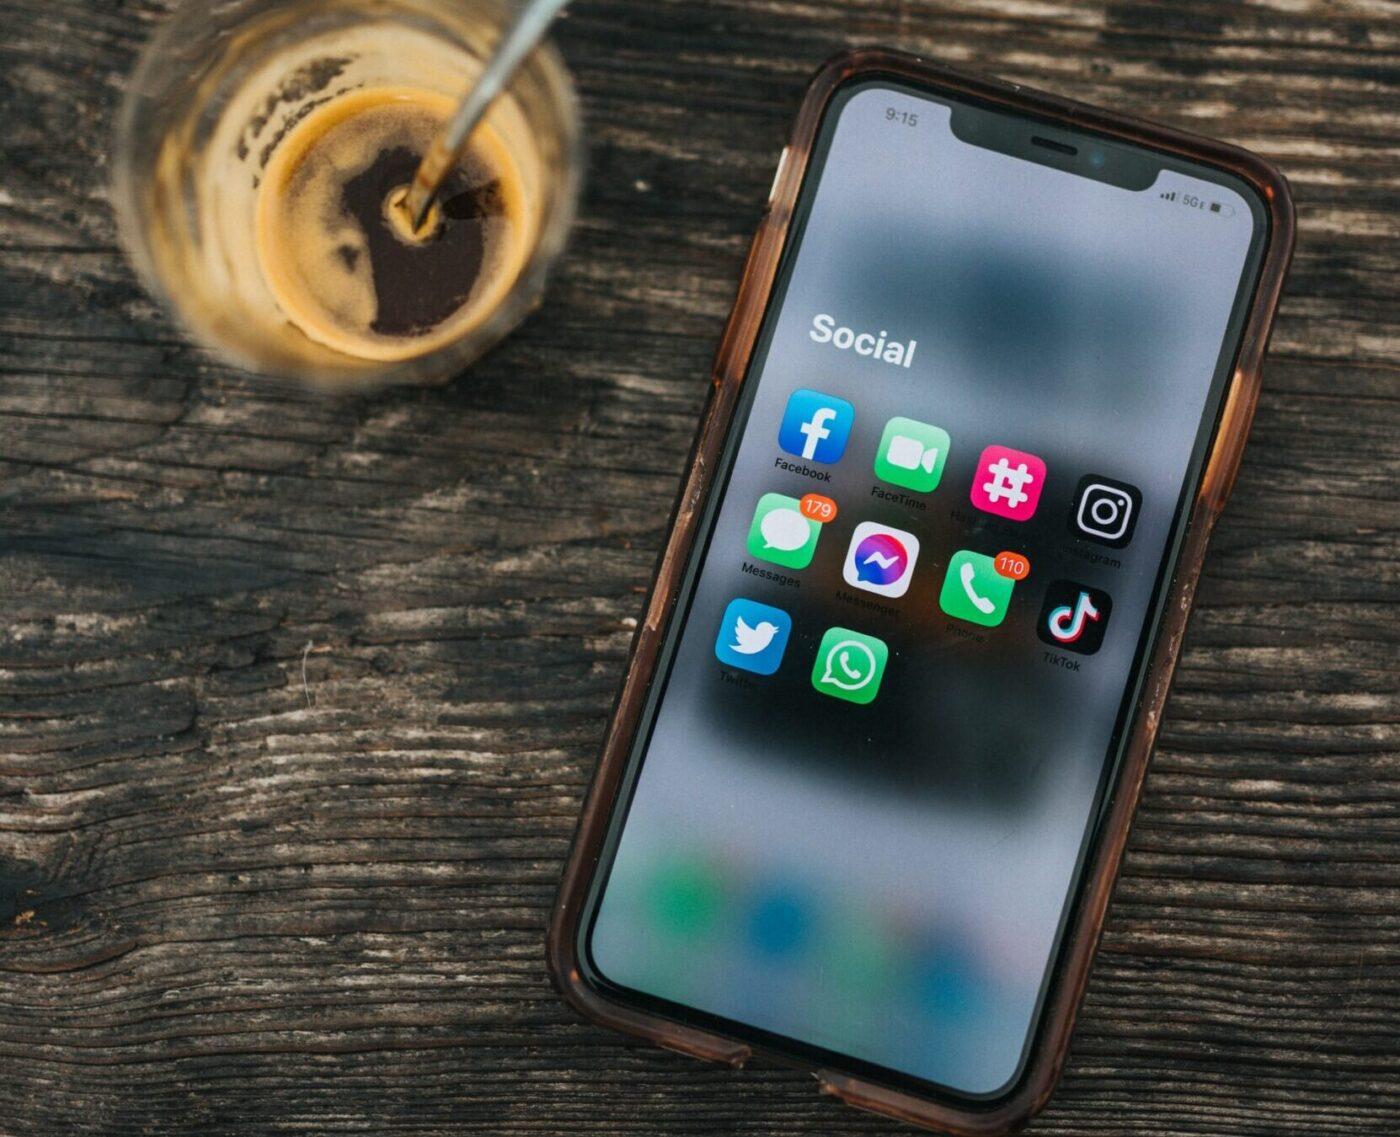 SOCIAL MEDIA MONITORING – CONTENT FÜR IHR MARKETING